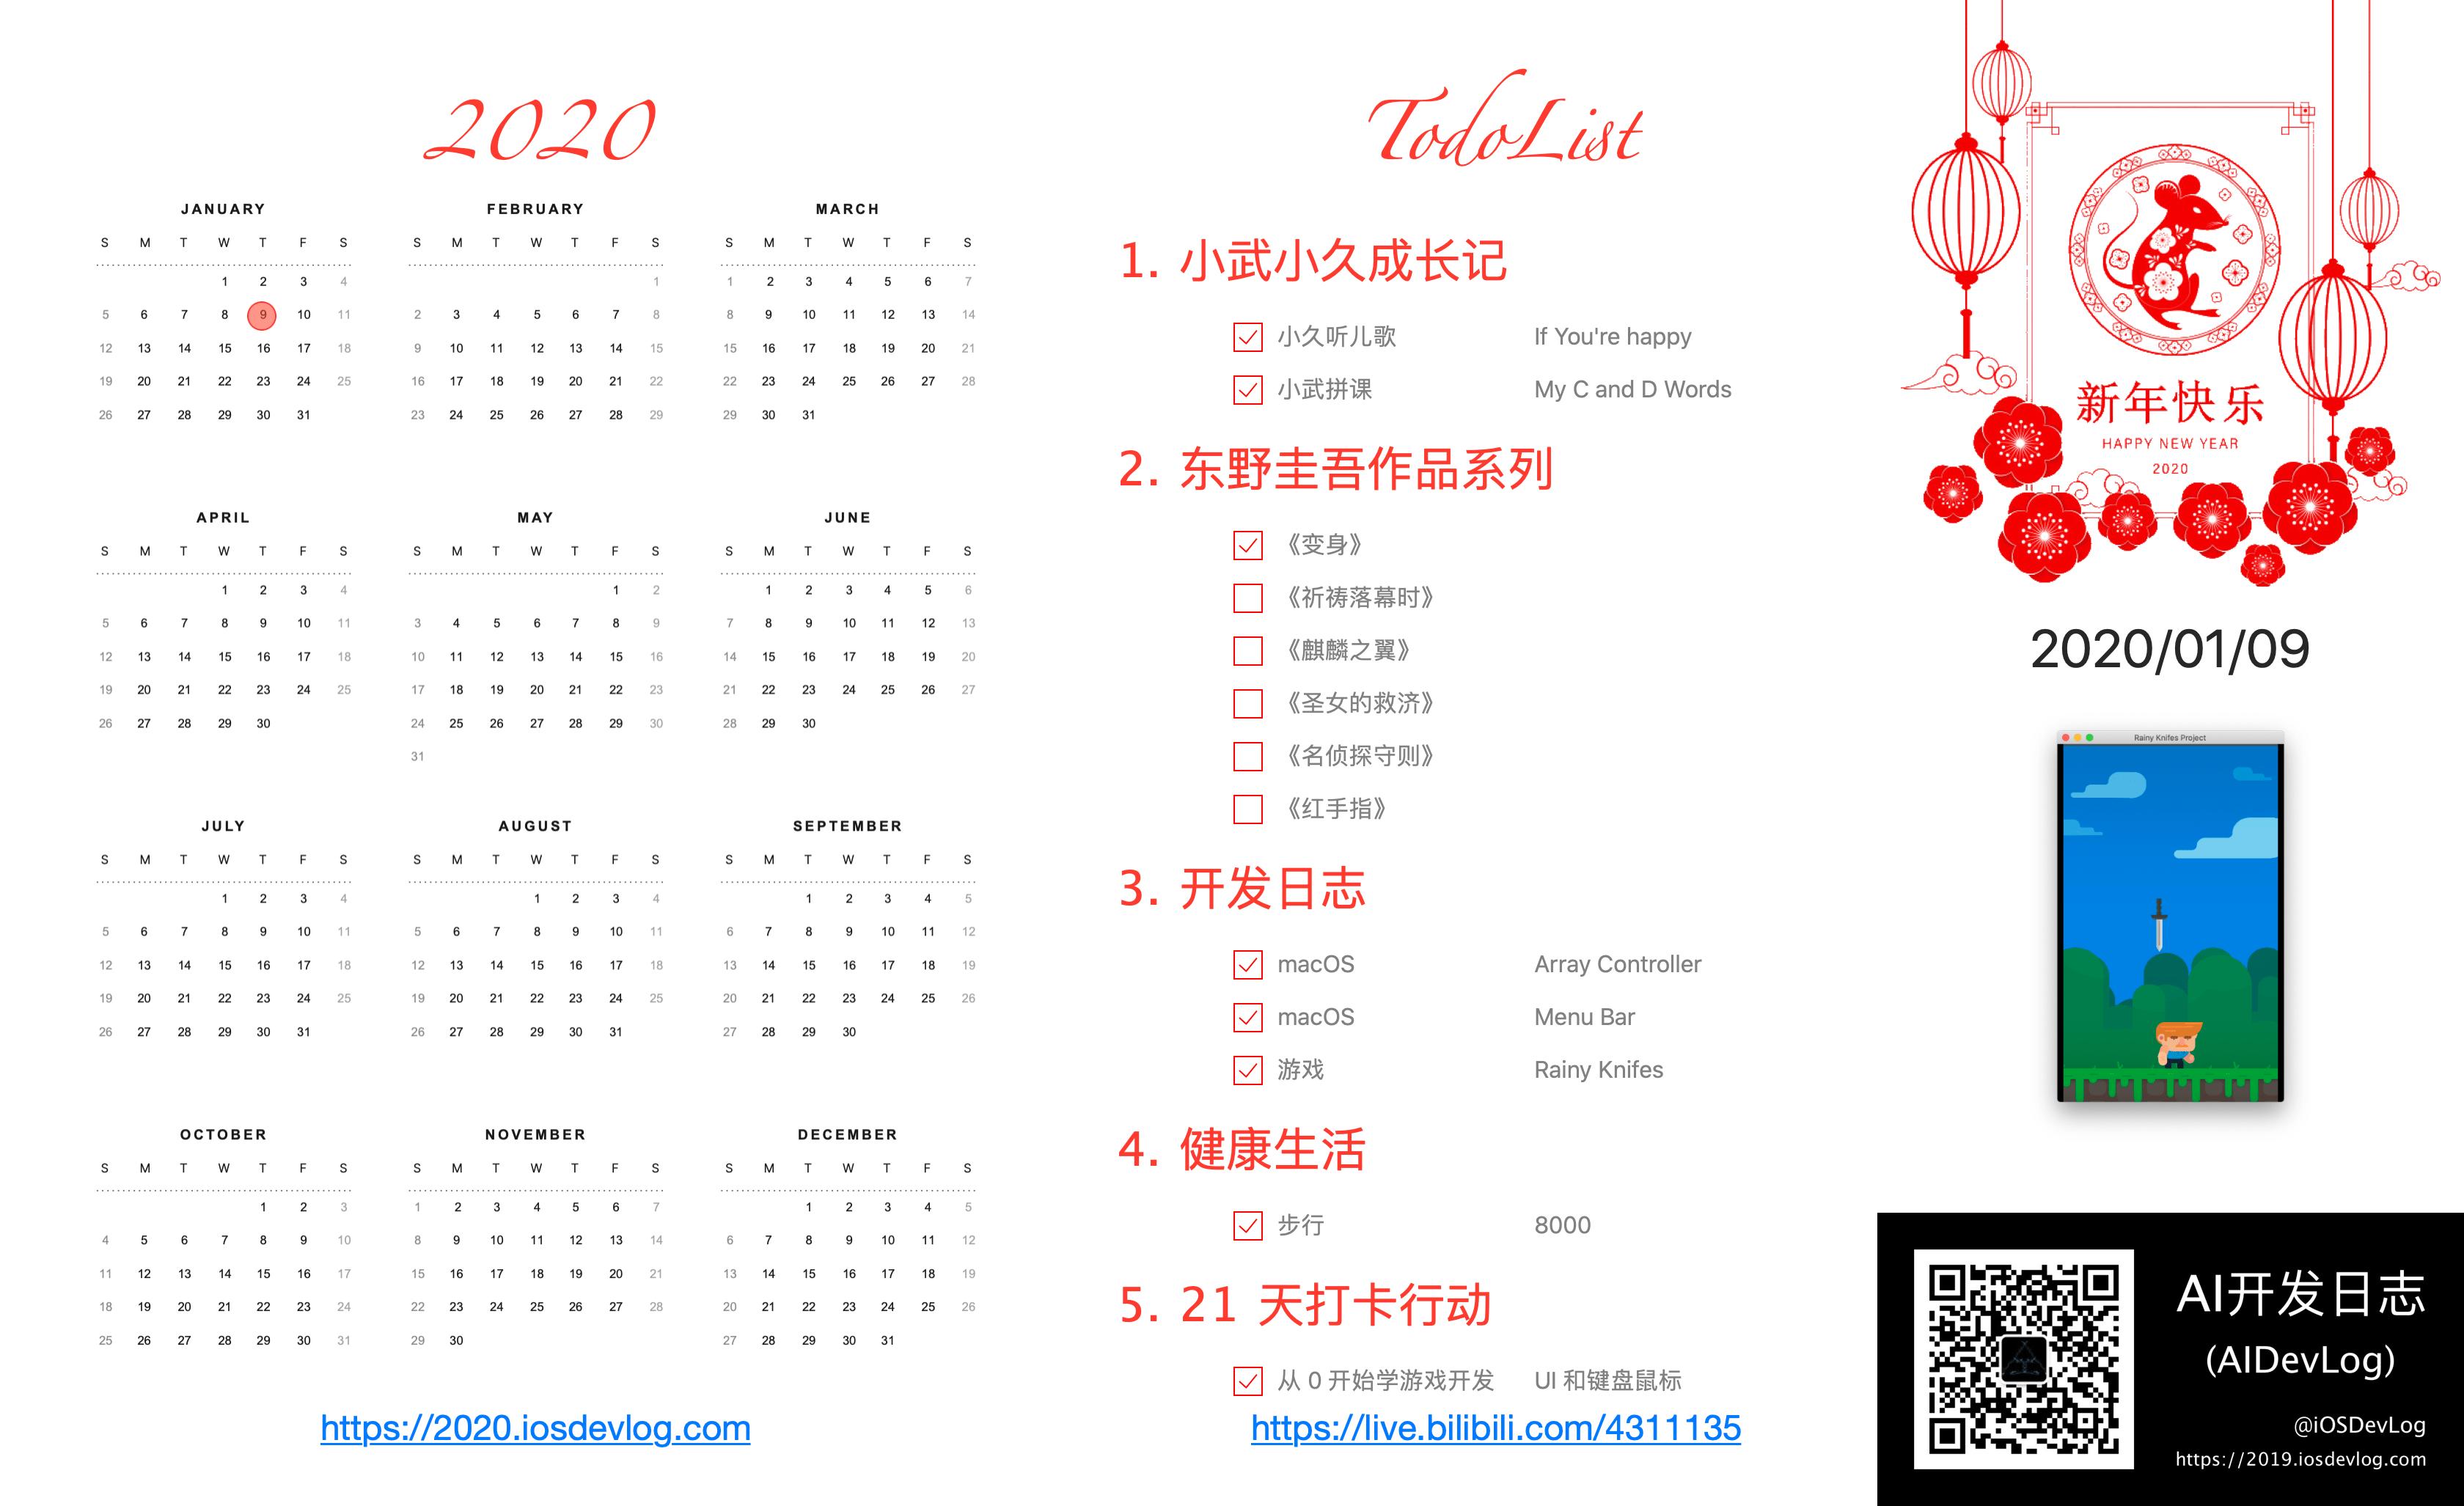 2020/01/09